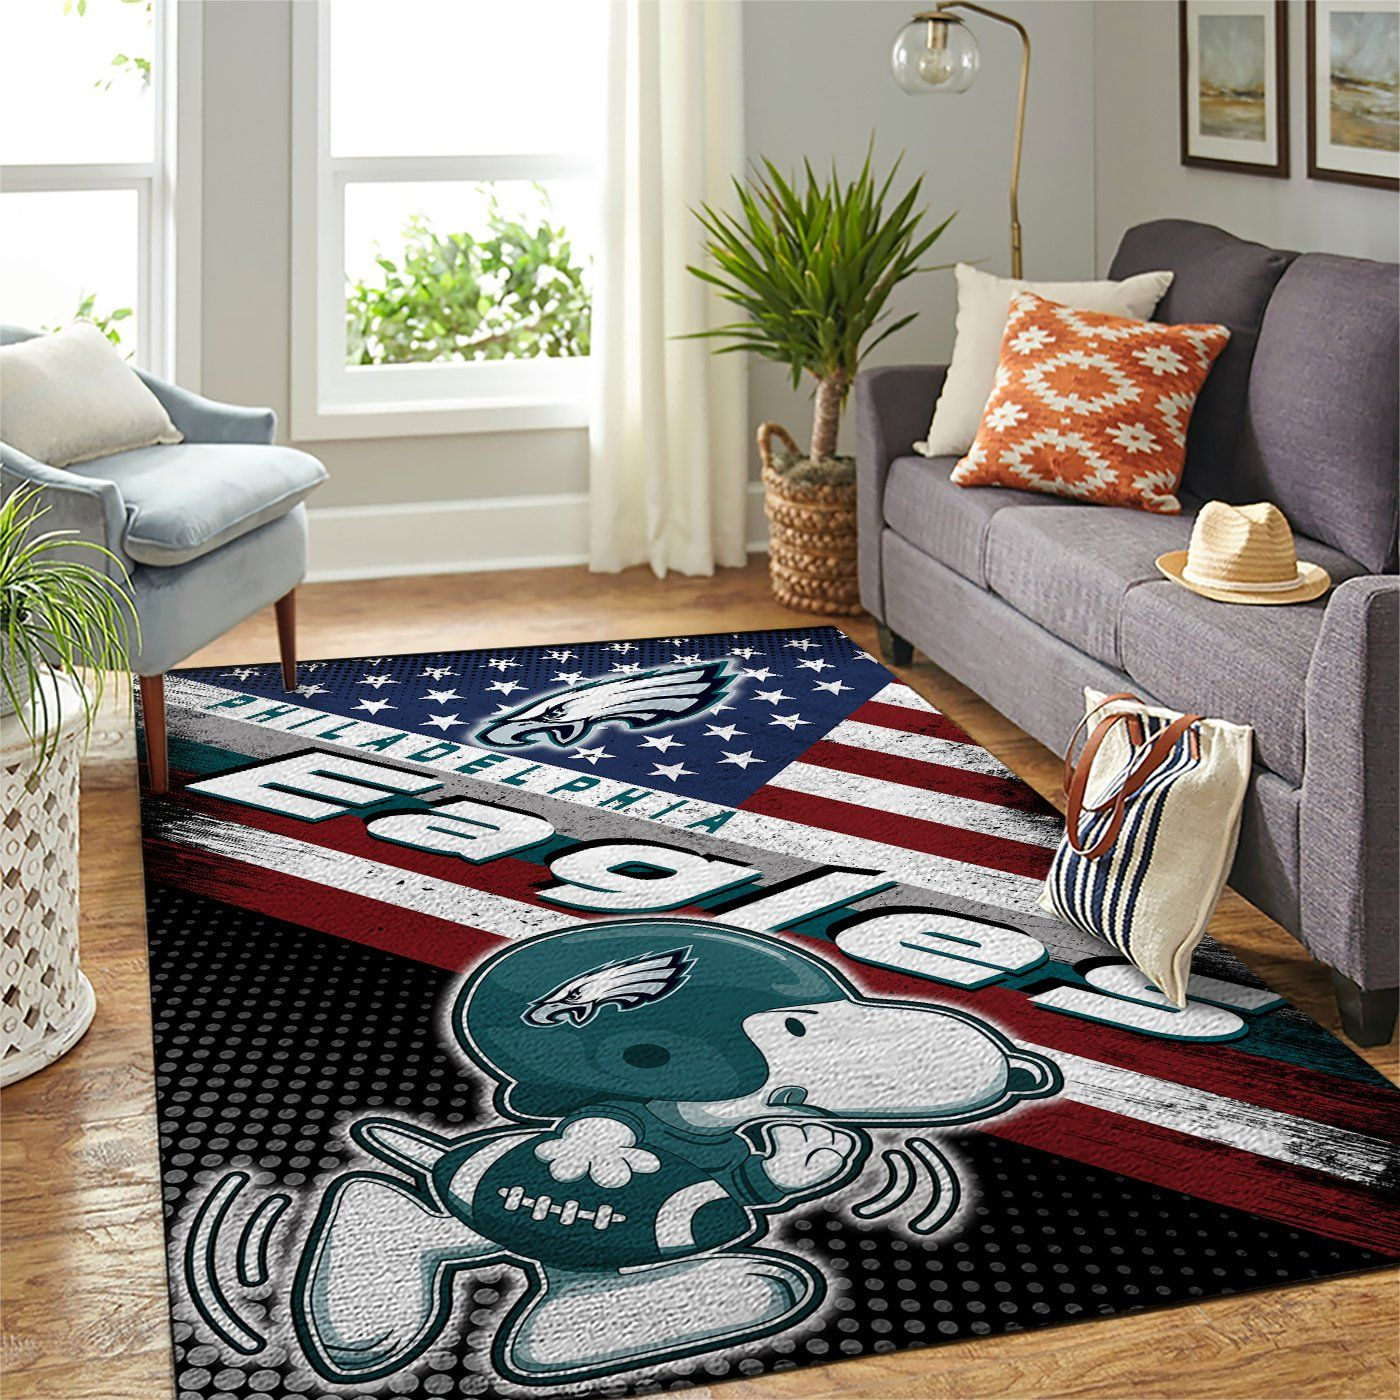 Philadelphia Eagles Nfl Team Logo Snoopy Us Style Nice Gift Home Decor Rectangle Area Rug Travels In Translation